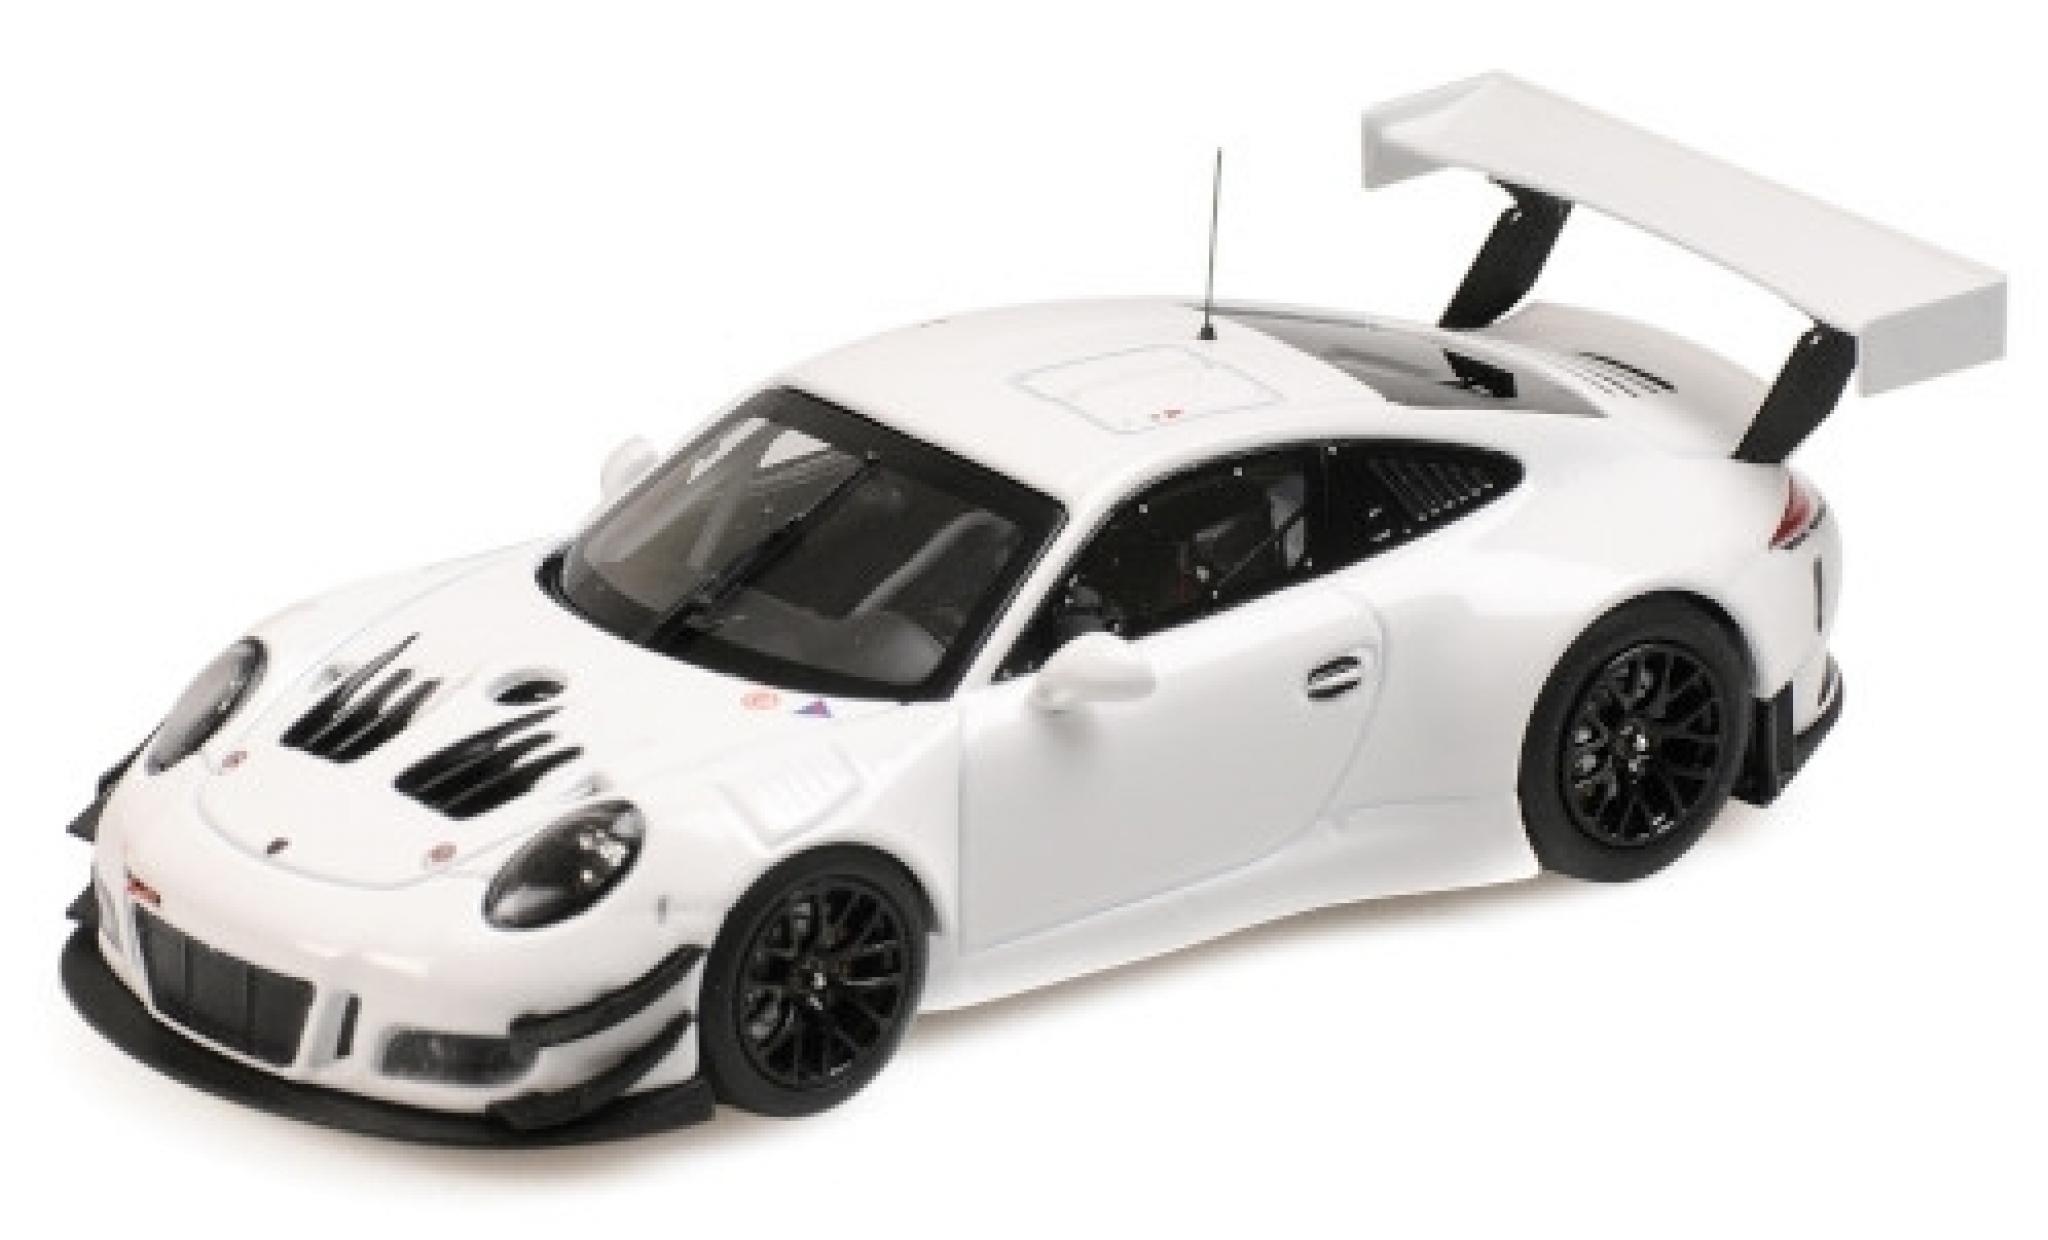 Porsche 991 GT3 R 1/43 Minichamps 911  white 2018 Plain Body Version